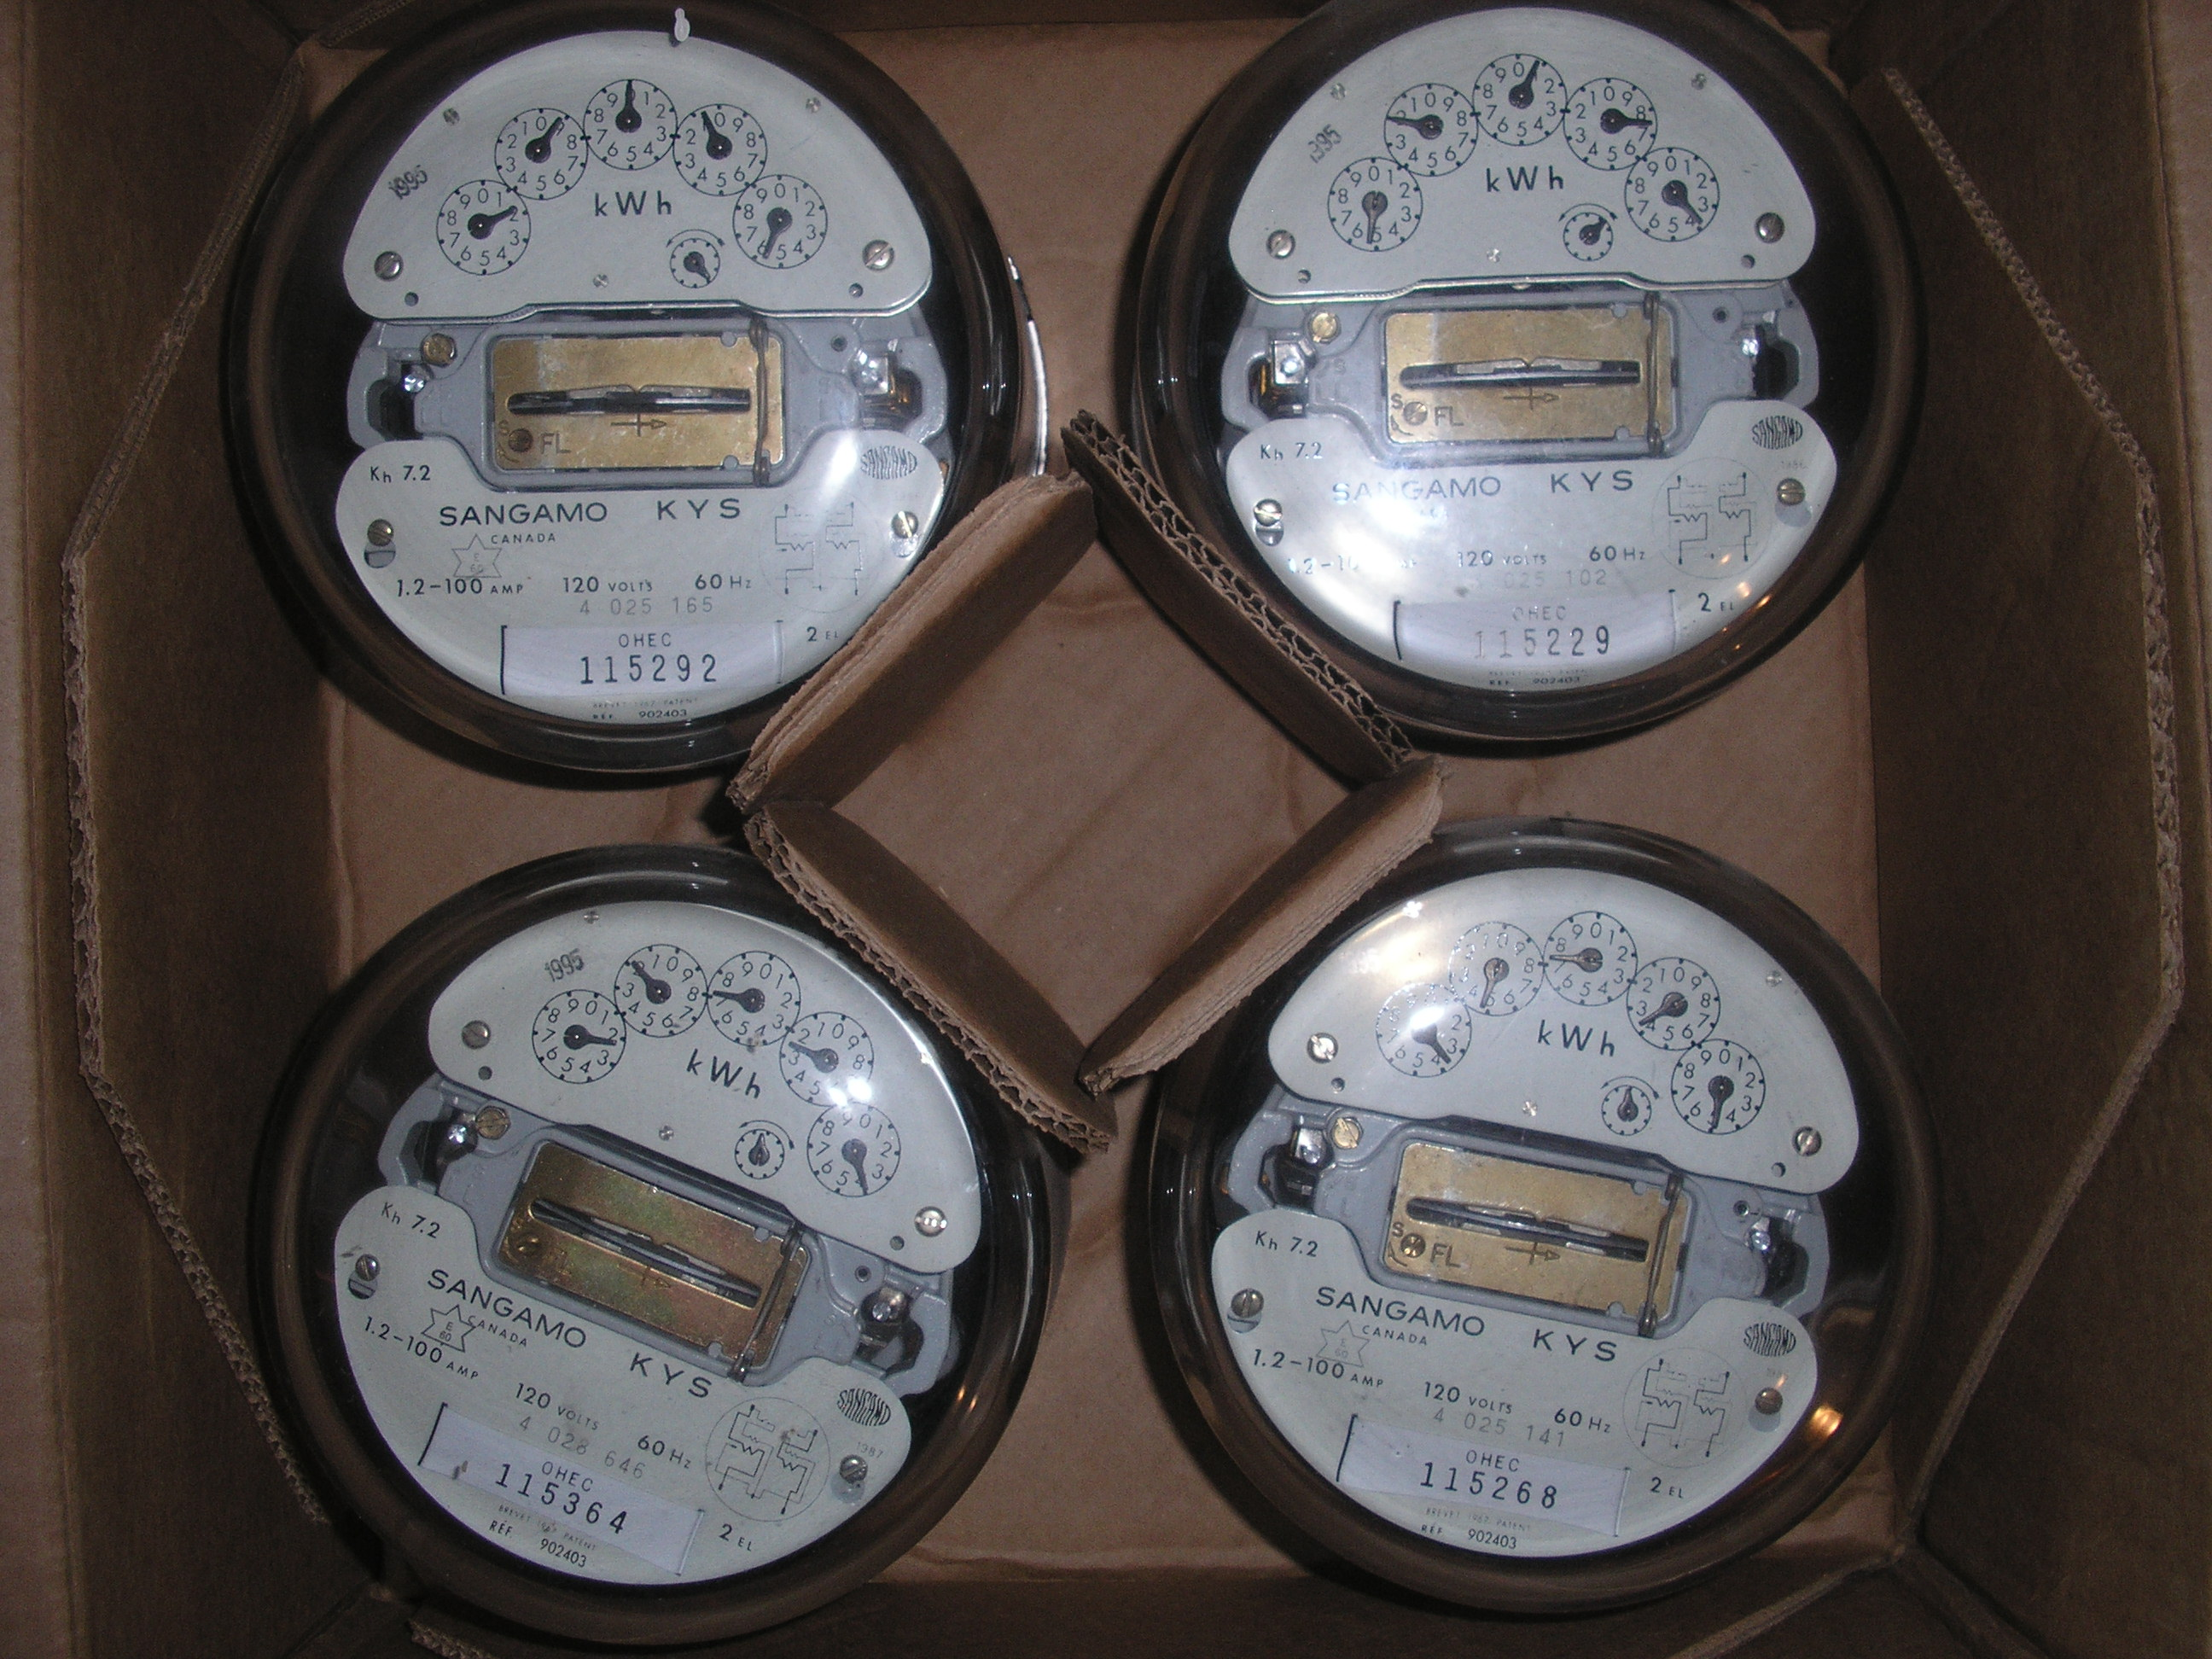 ge kv2c multifunction meter fitzall wiring diagram potentiometer library